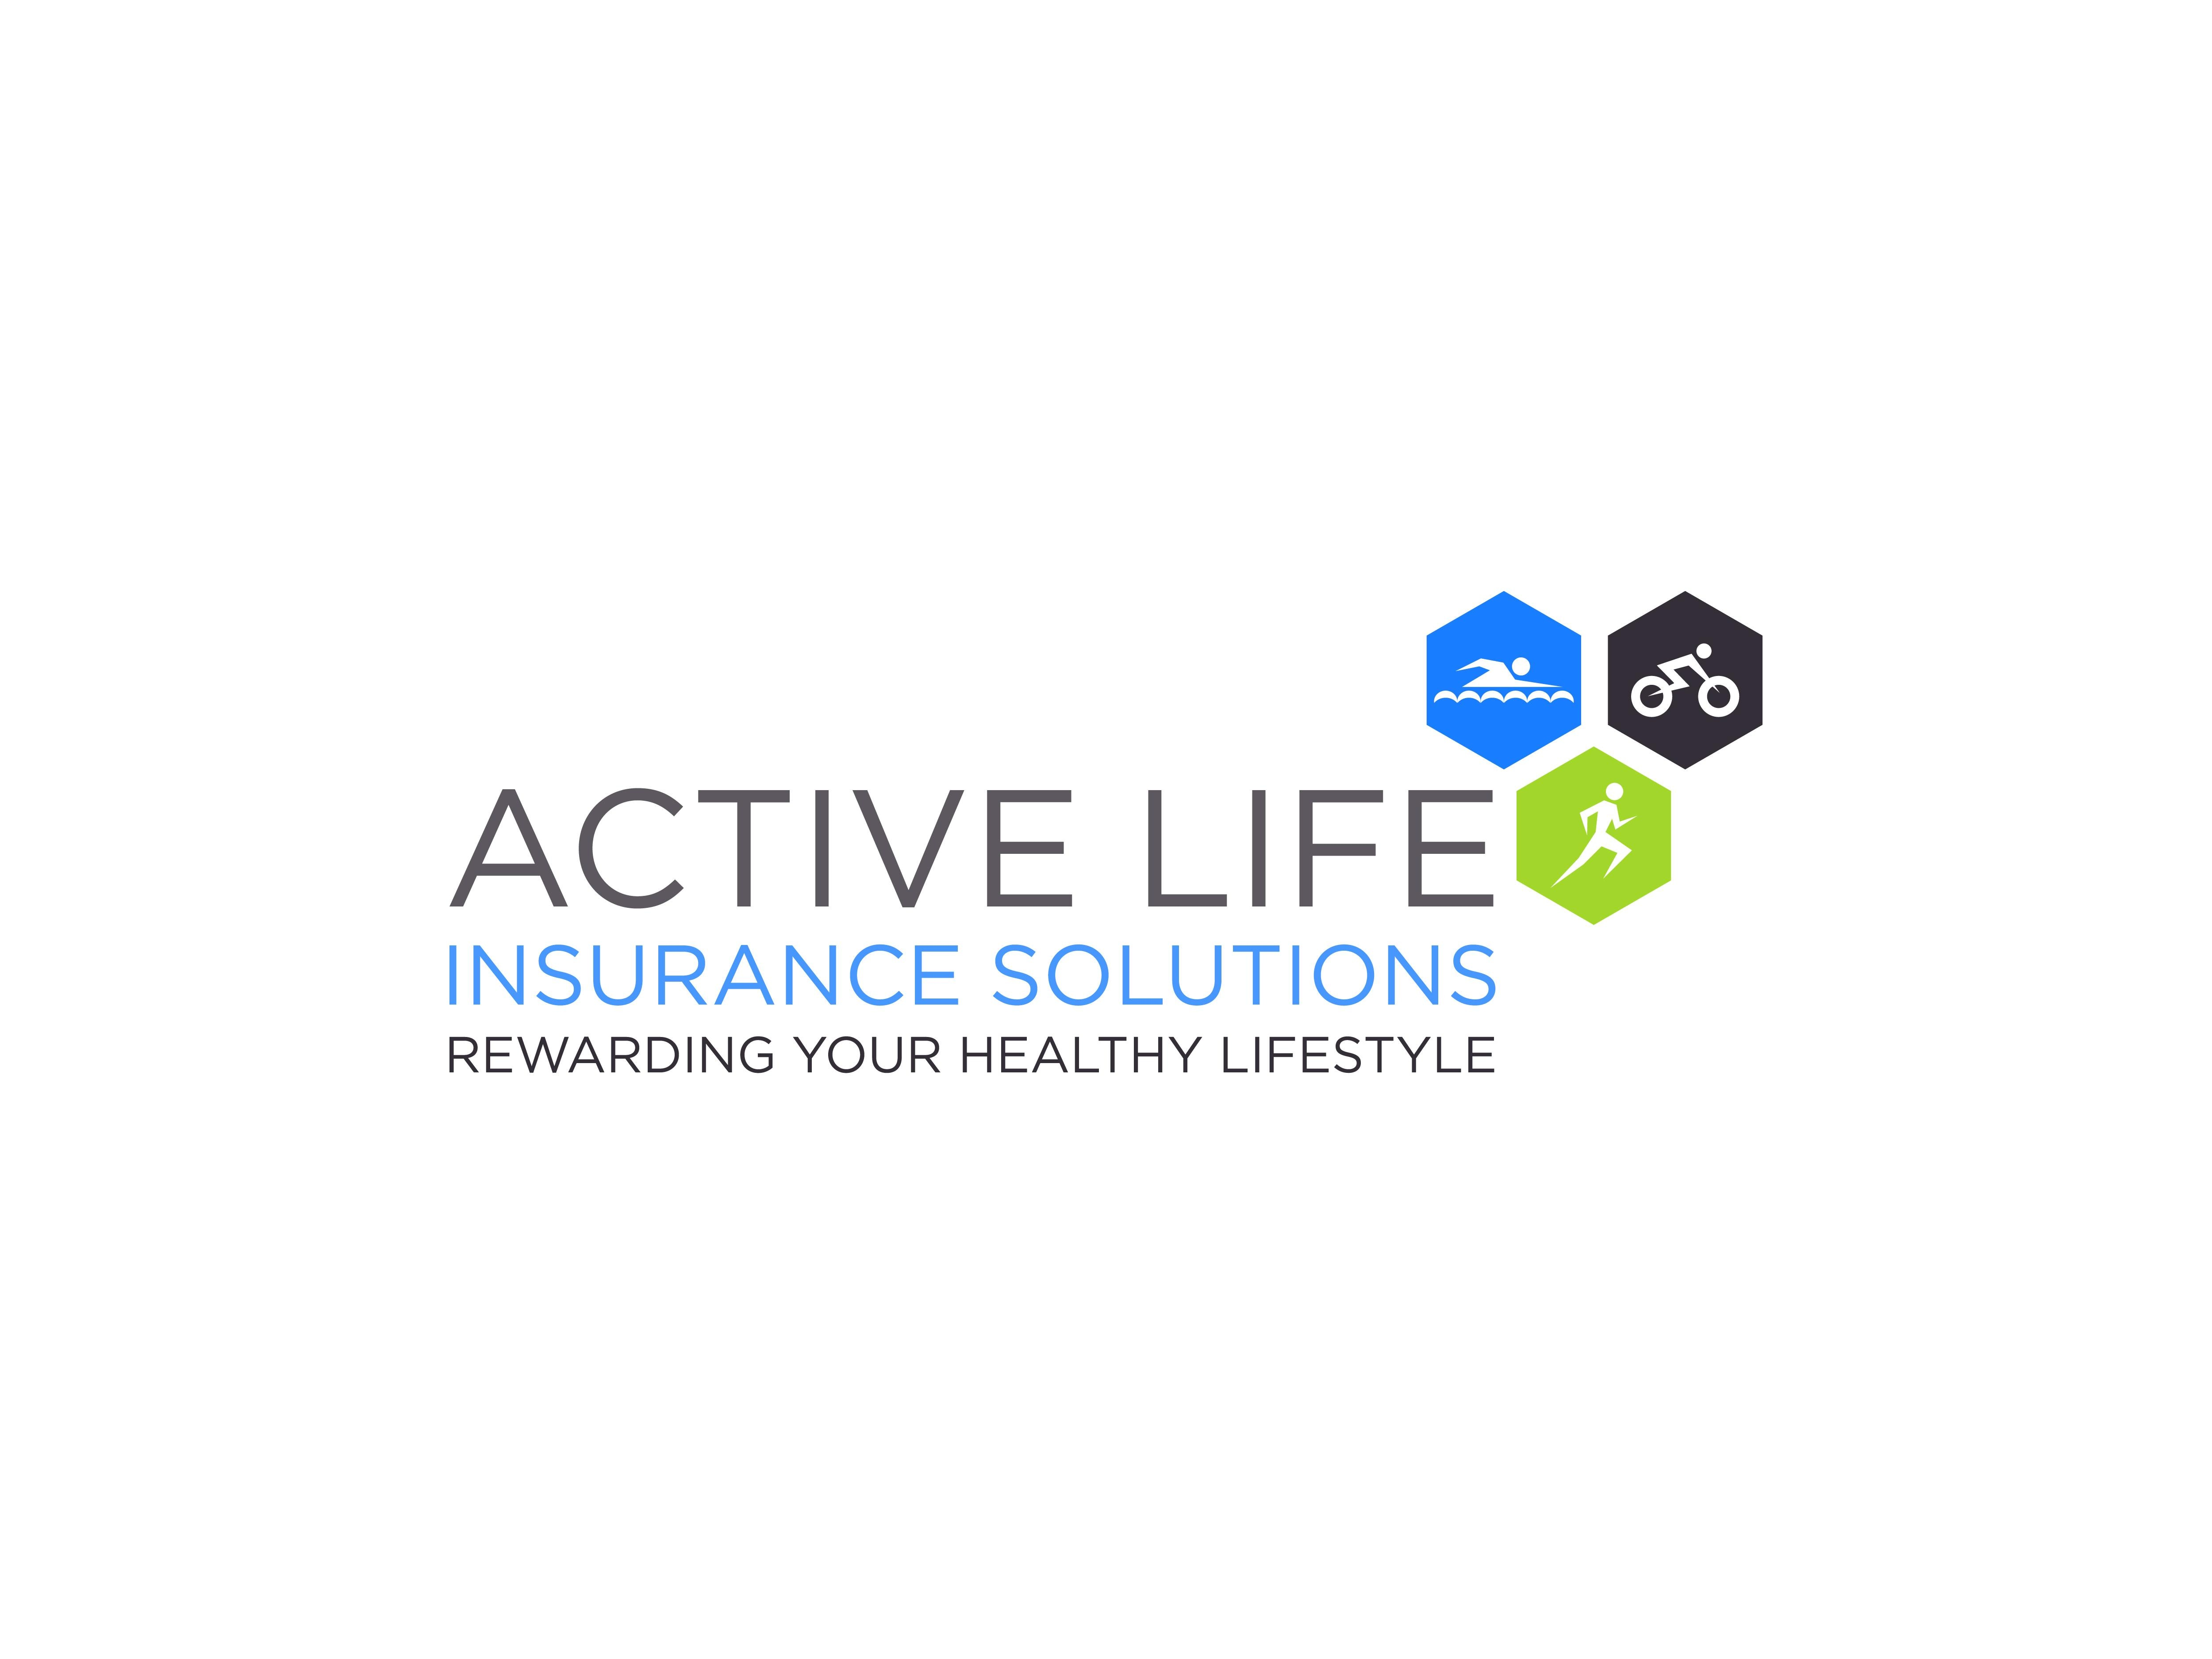 EDWARD GONZALEZ Your Financial Professional & Insurance Agent